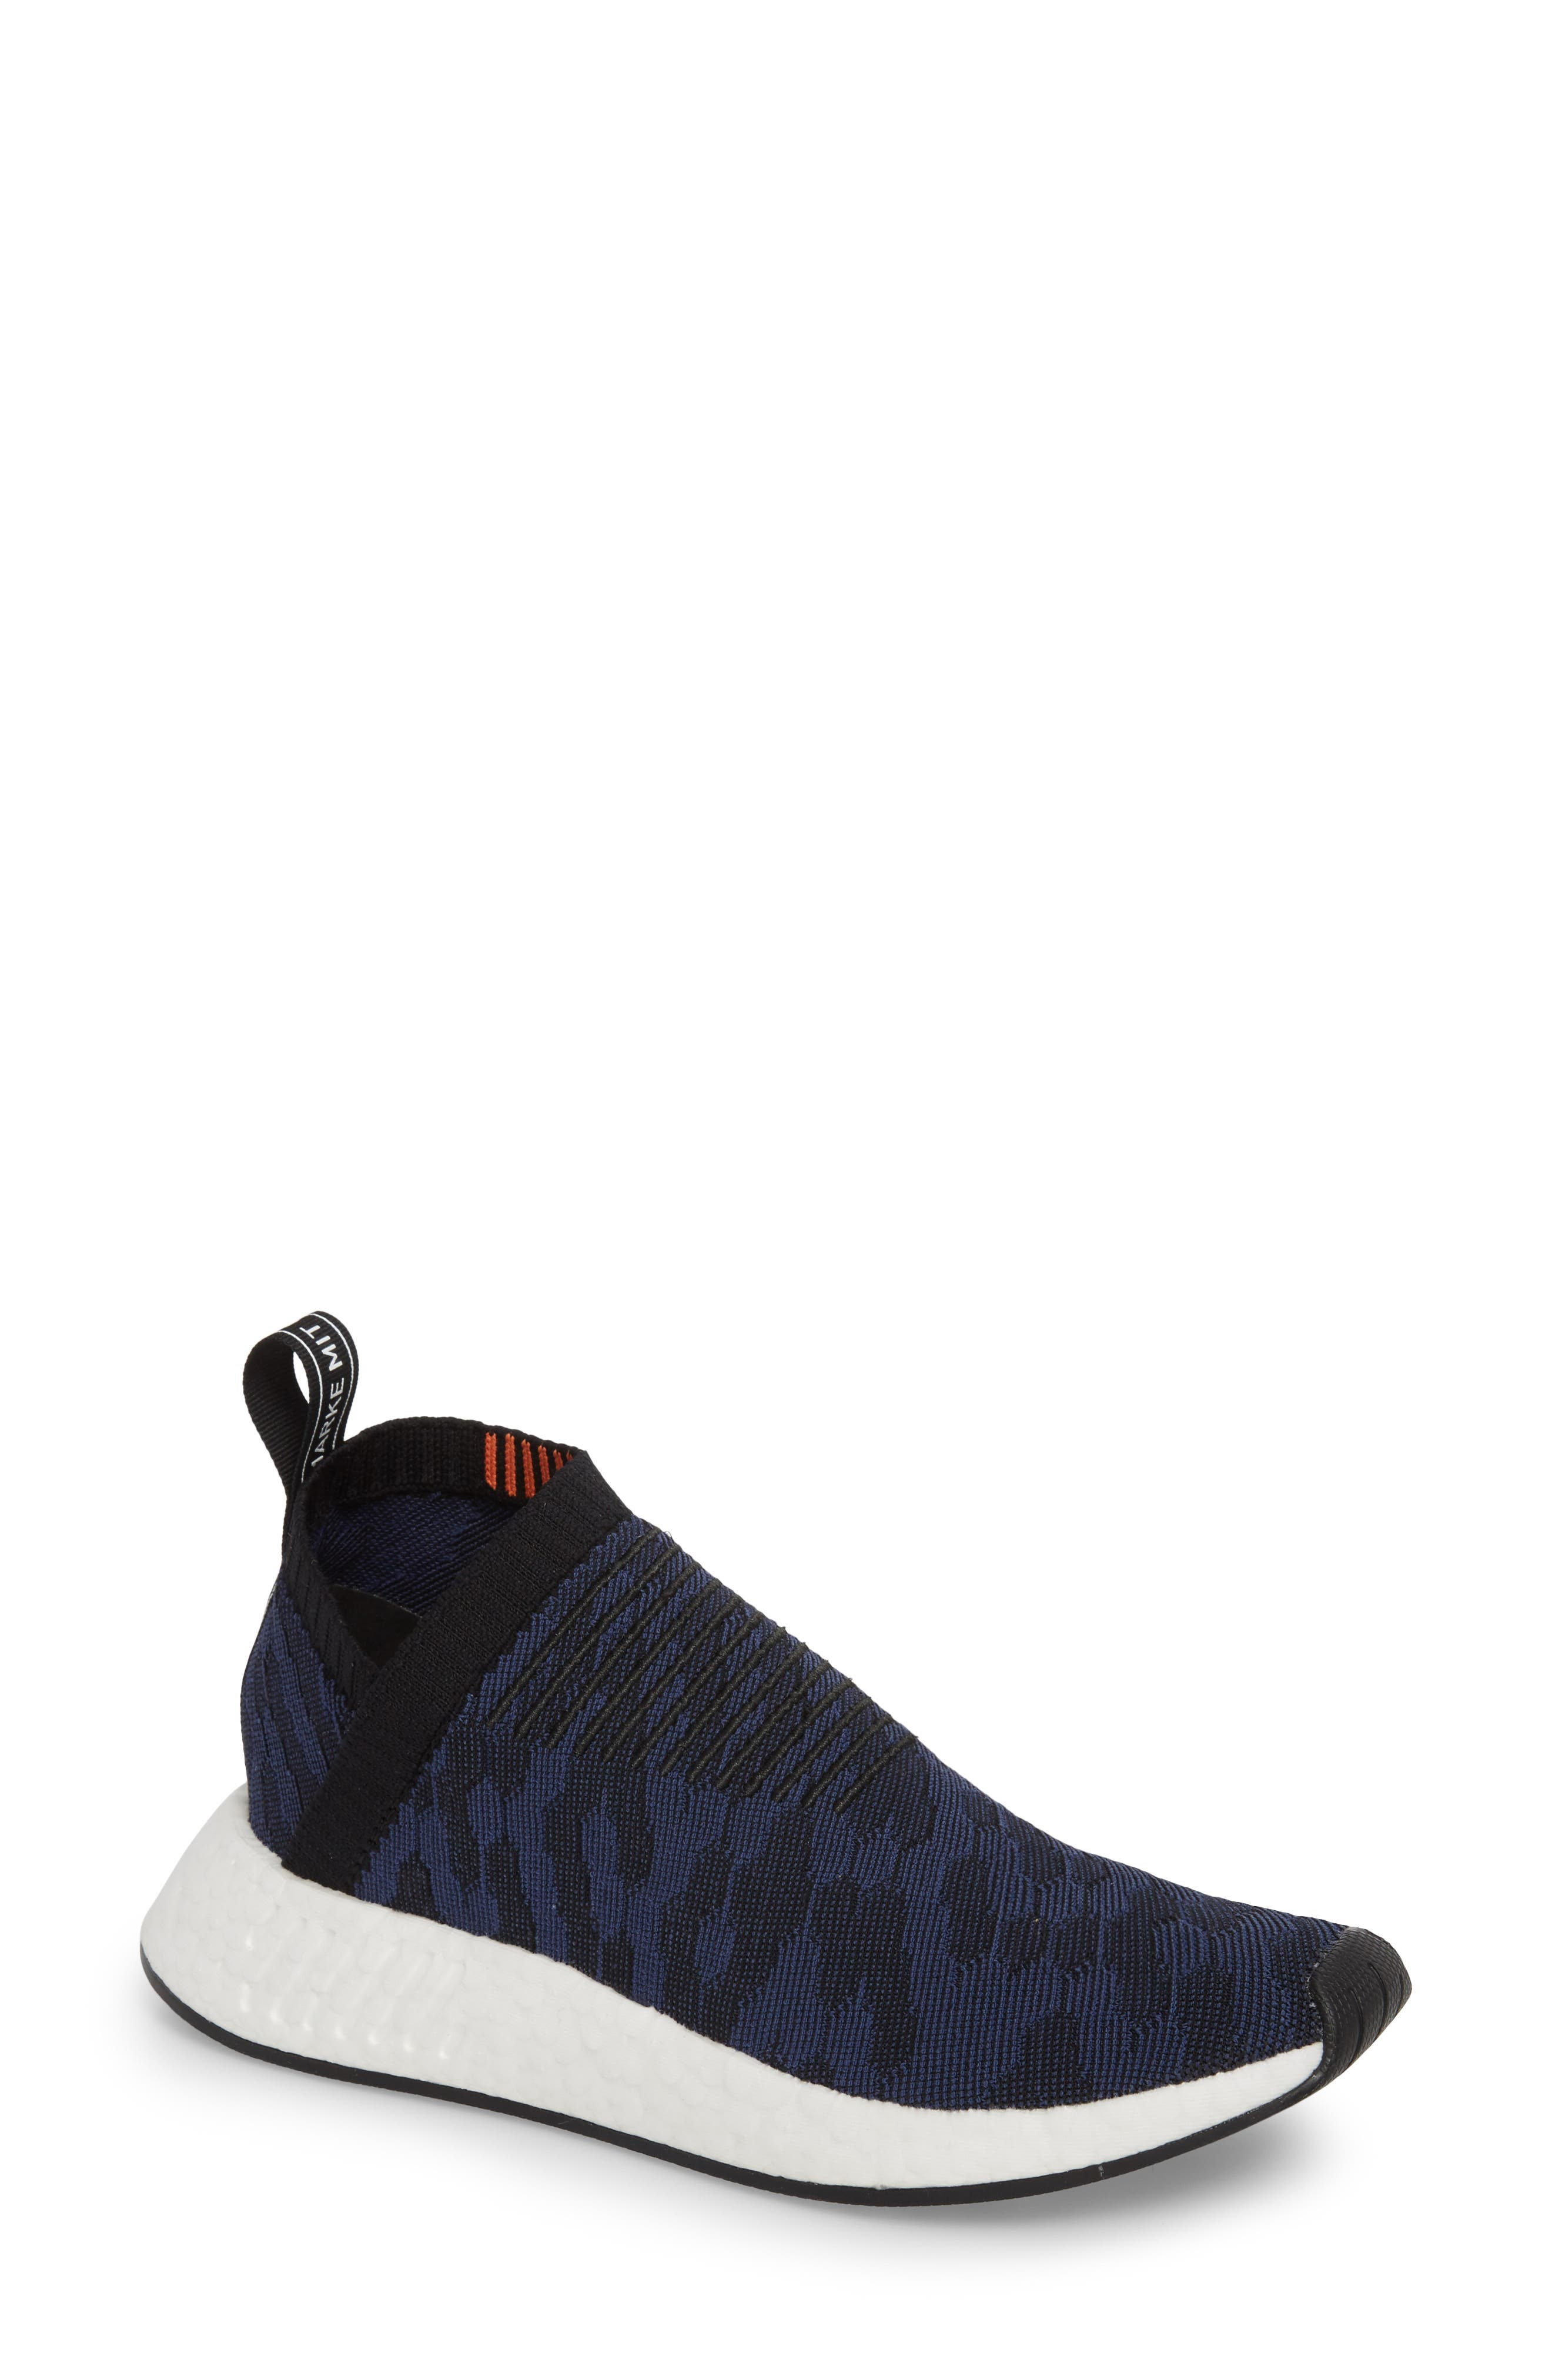 NMD CS2 Primeknit Sneaker,                             Main thumbnail 1, color,                             Core Black/ Noble Indigo